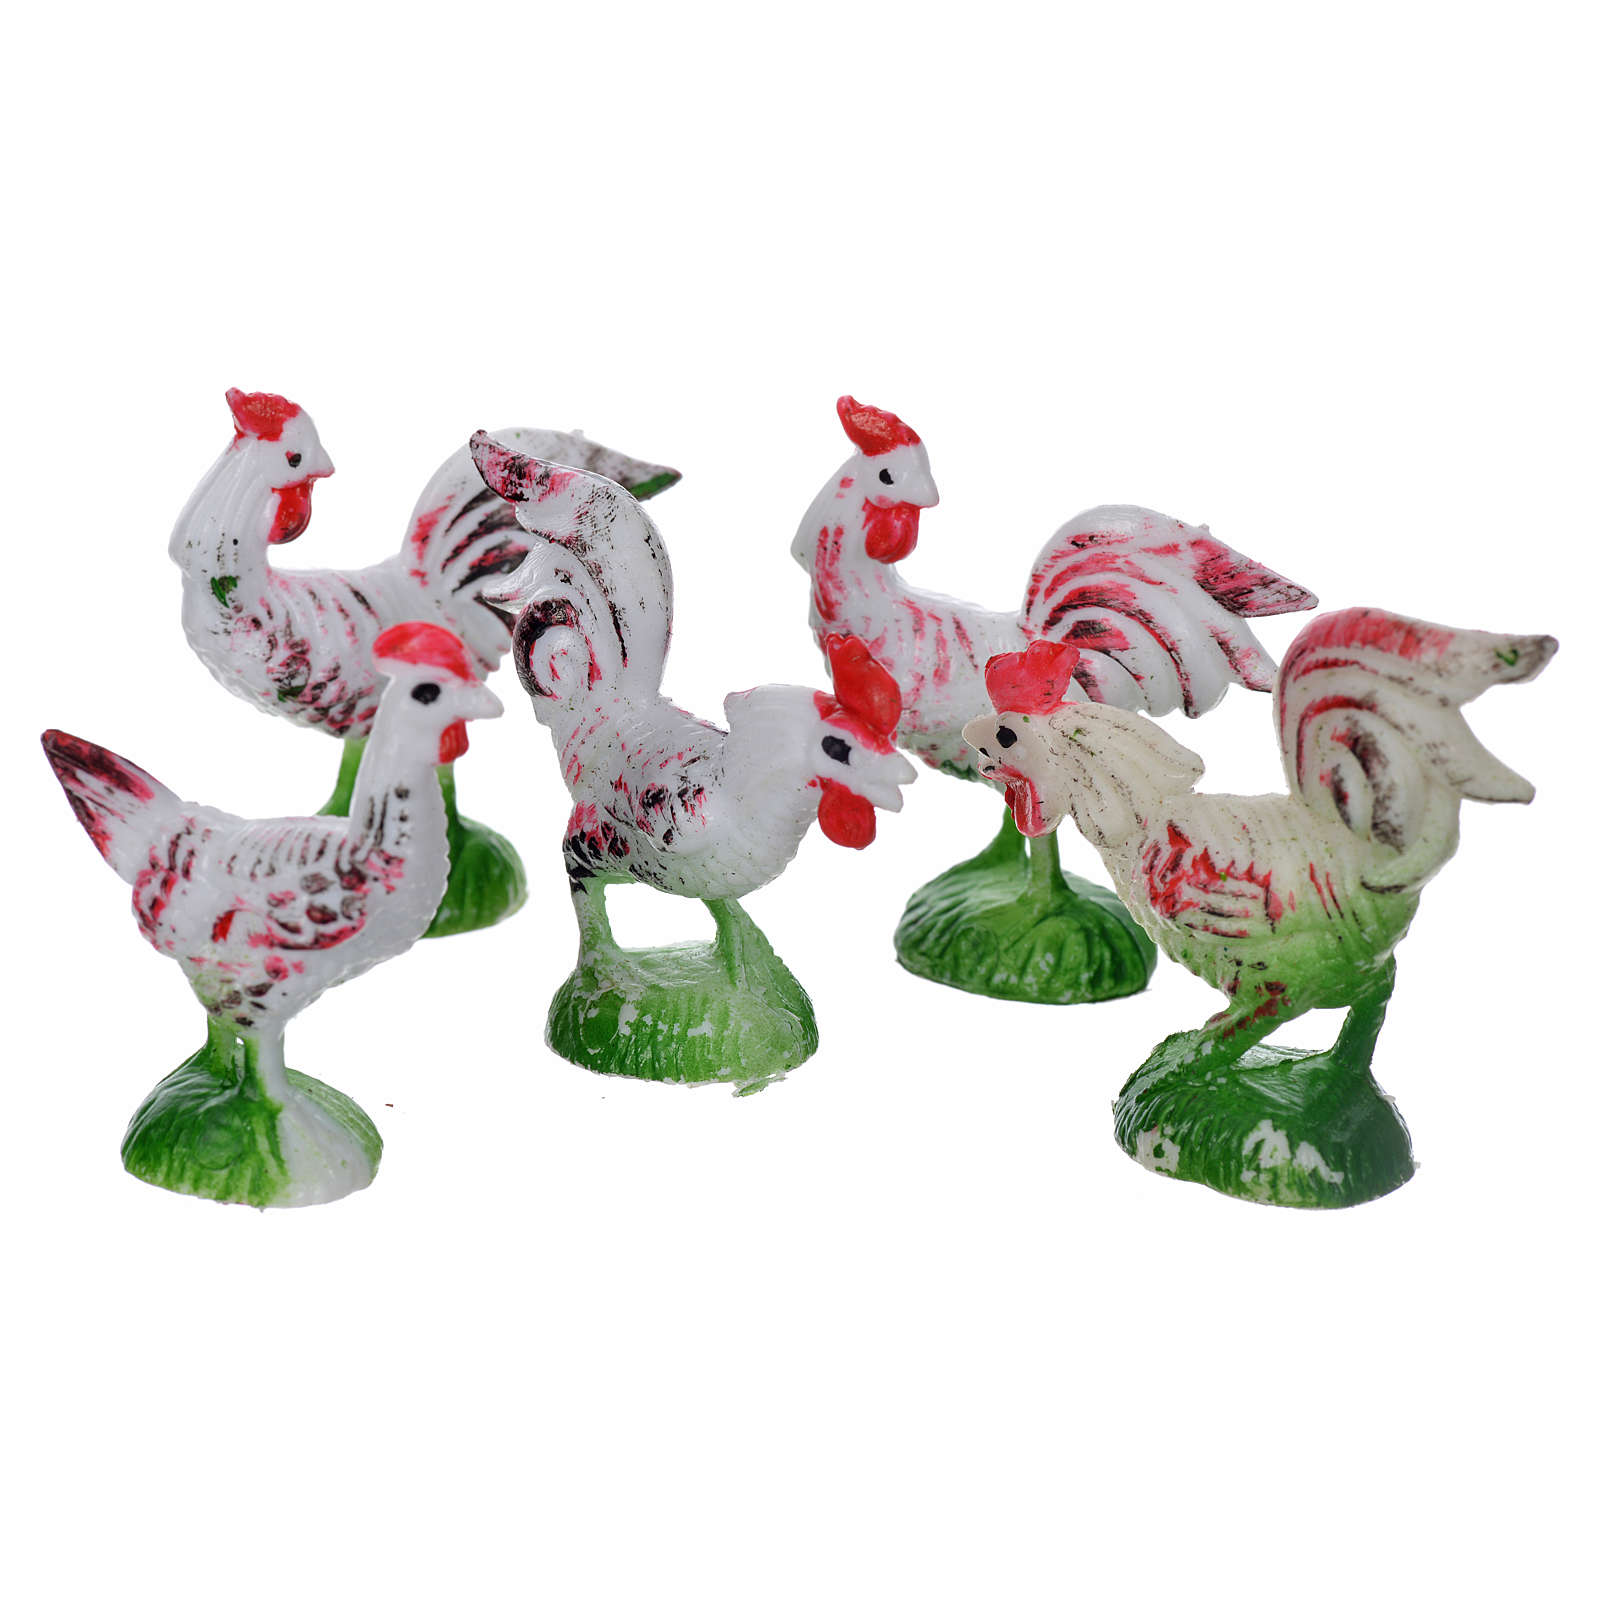 Nativity figurine, cocks and hens 5 pcs 3